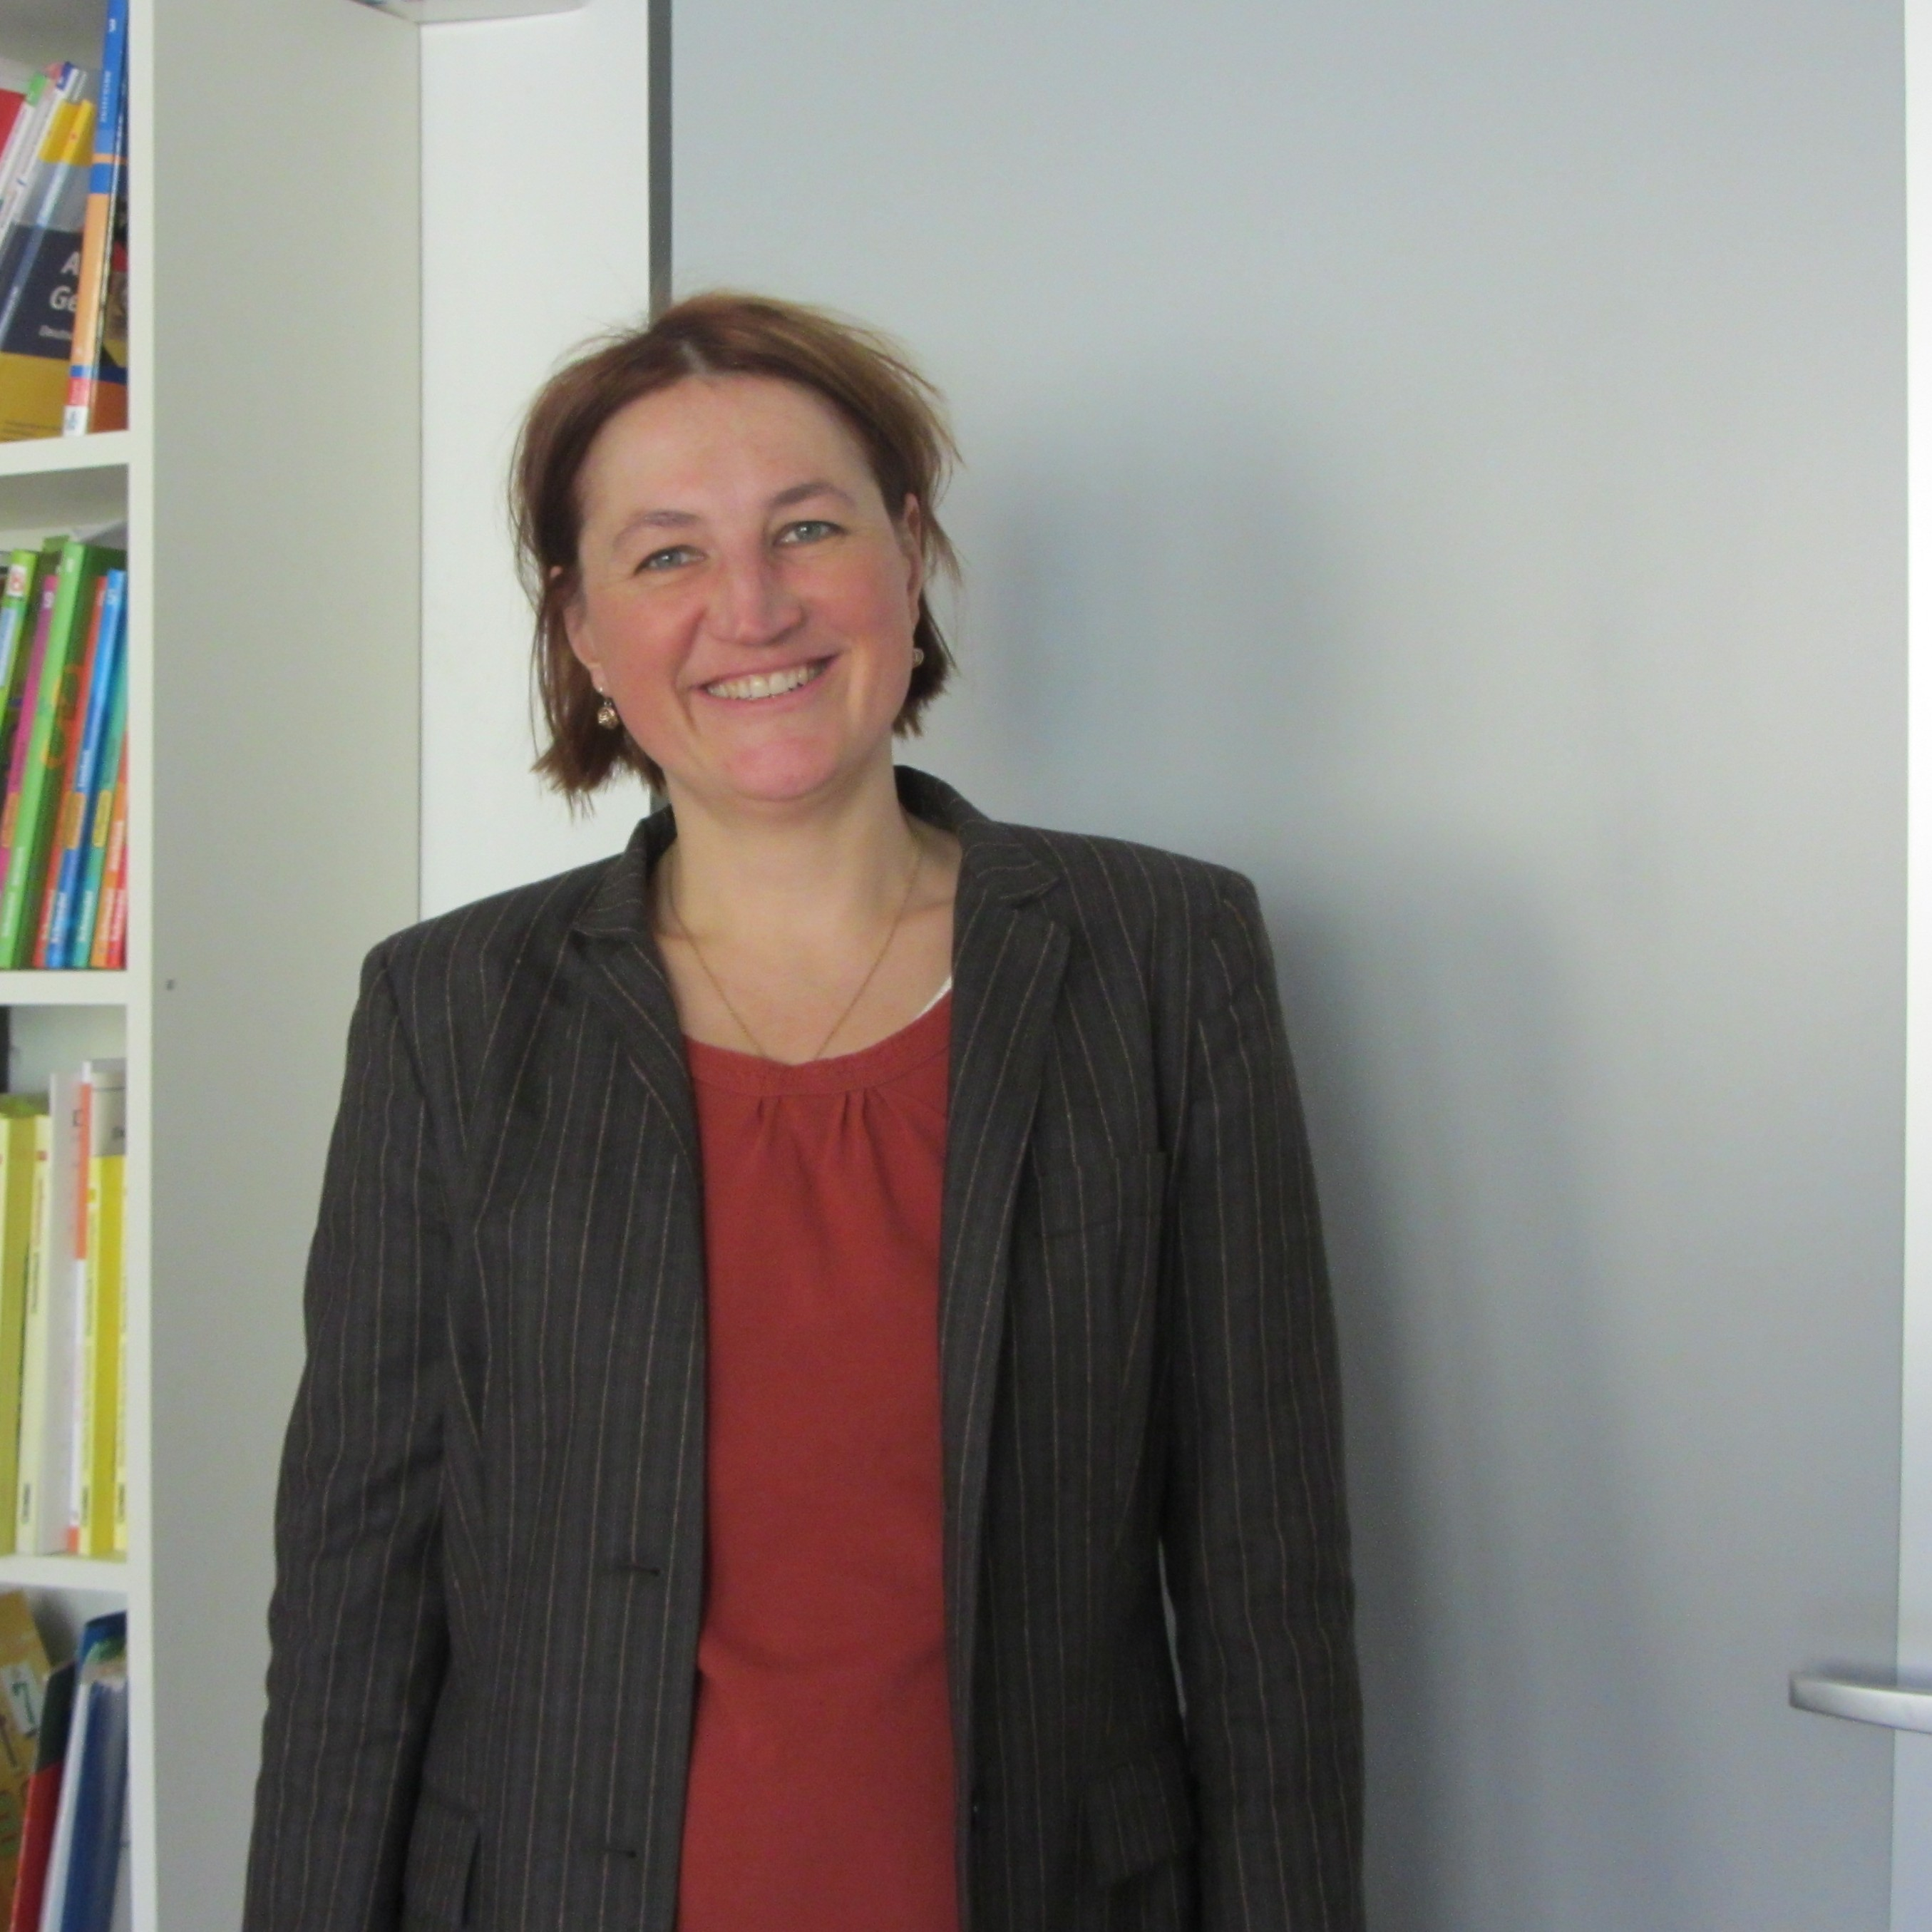 Frau Feld